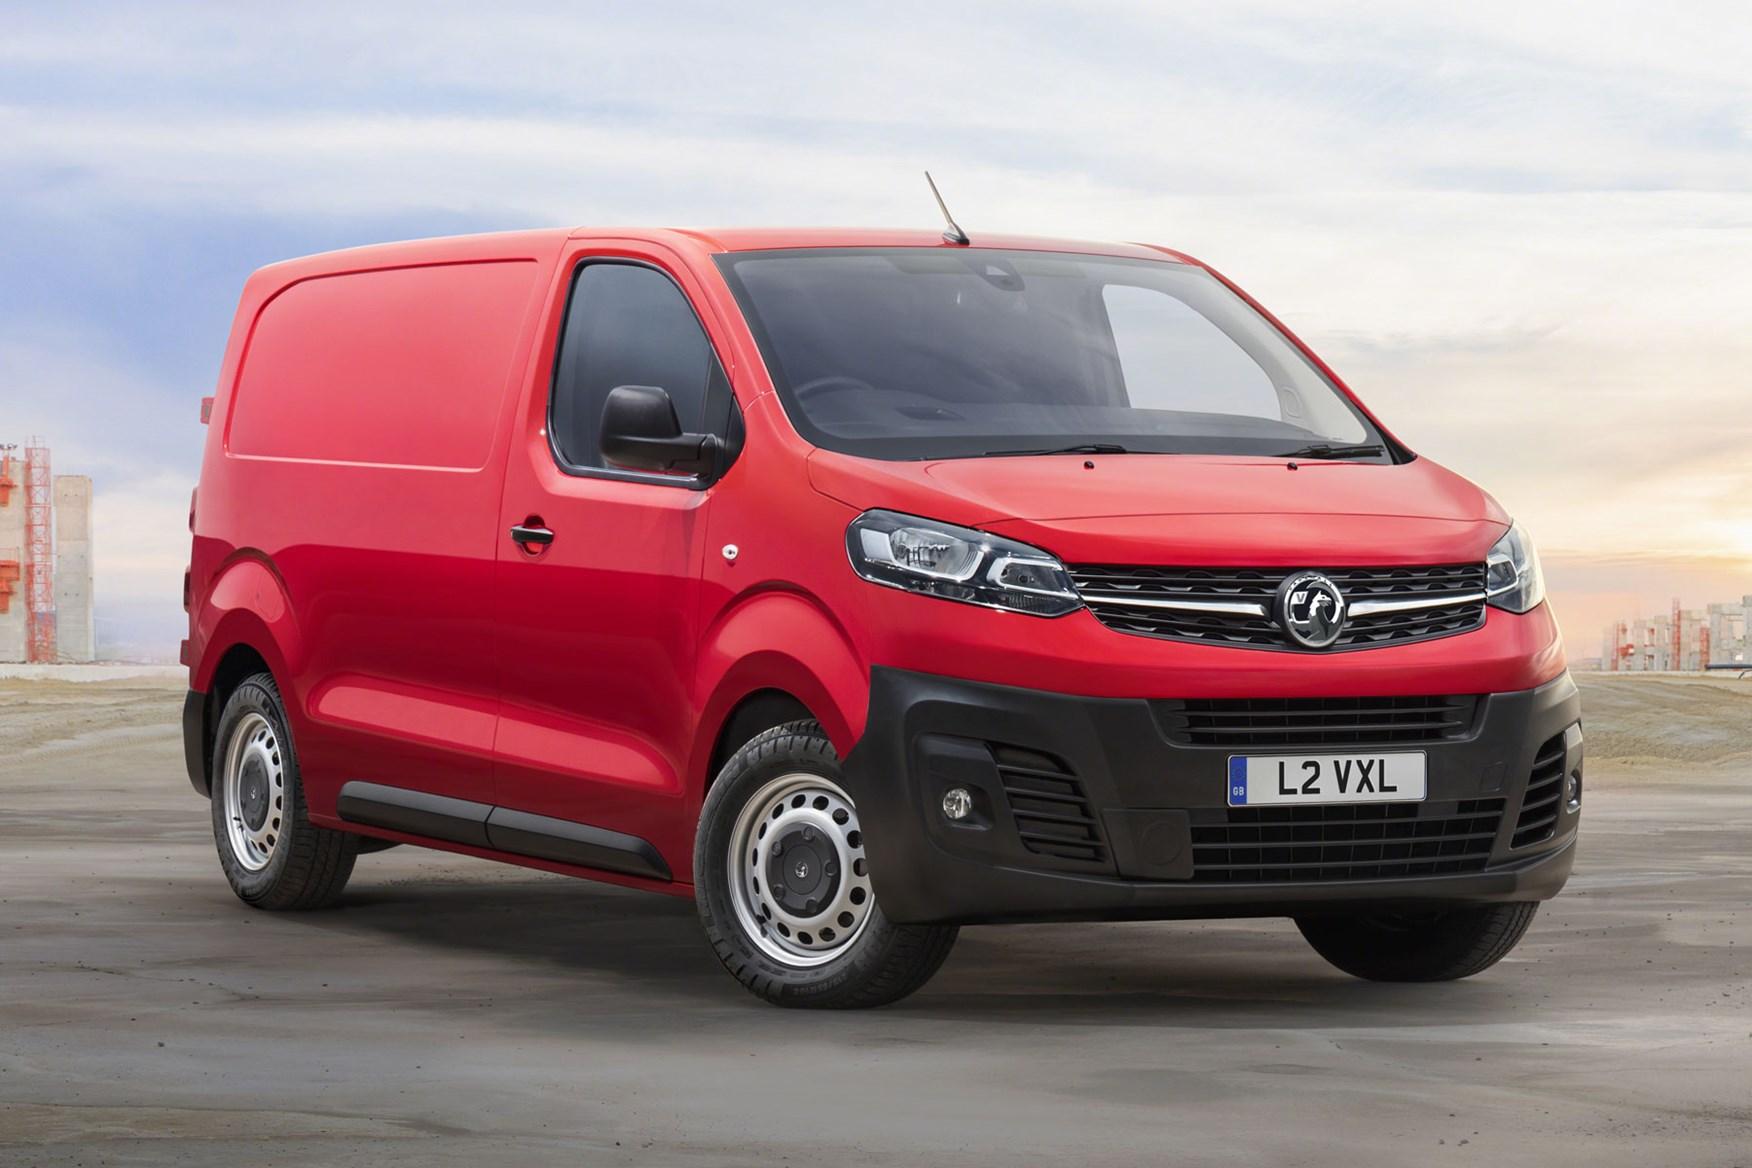 car pictures review: neuer opel vivaro 2020